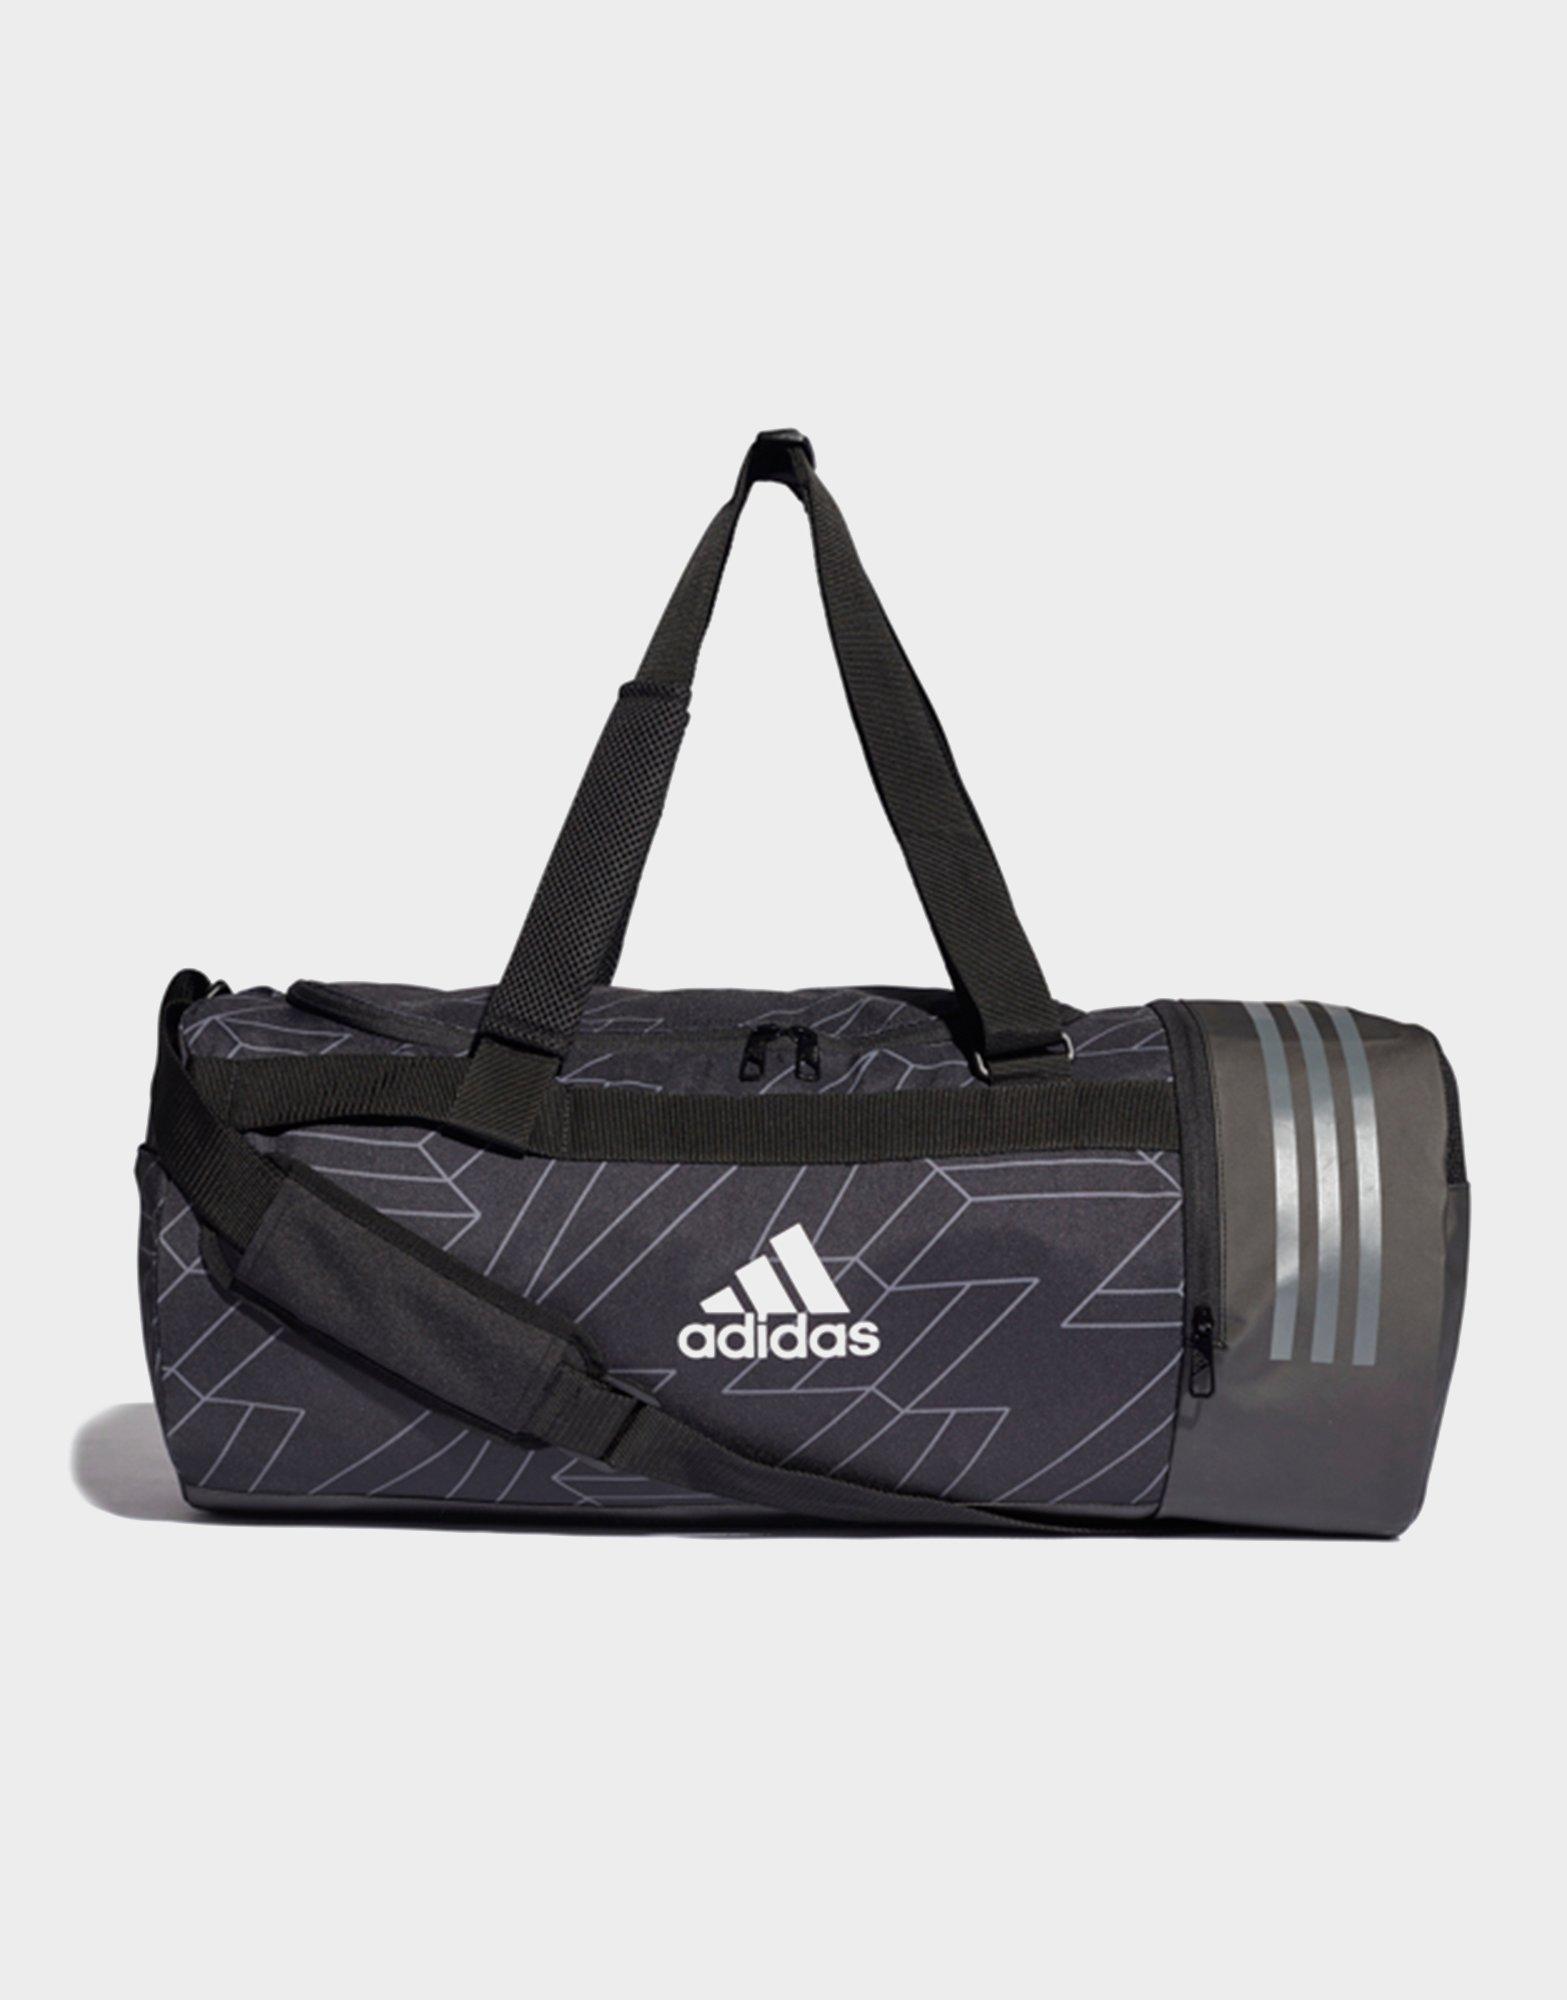 8734ac2978ac adidas Core Duffel Bag in Black for Men - Lyst